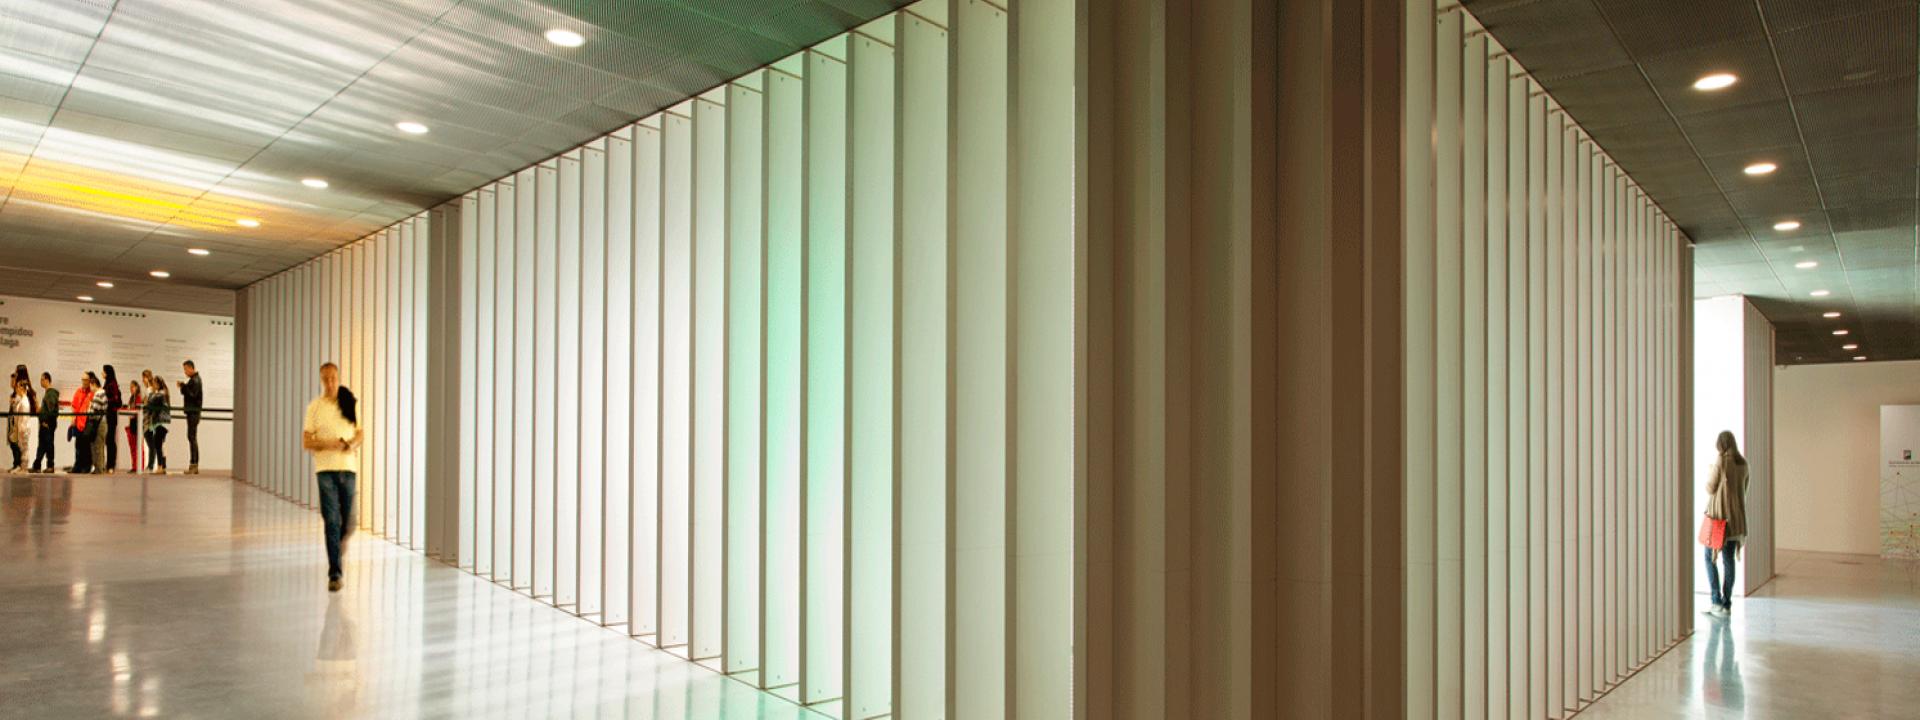 Slide-PompidouMalaga_02.